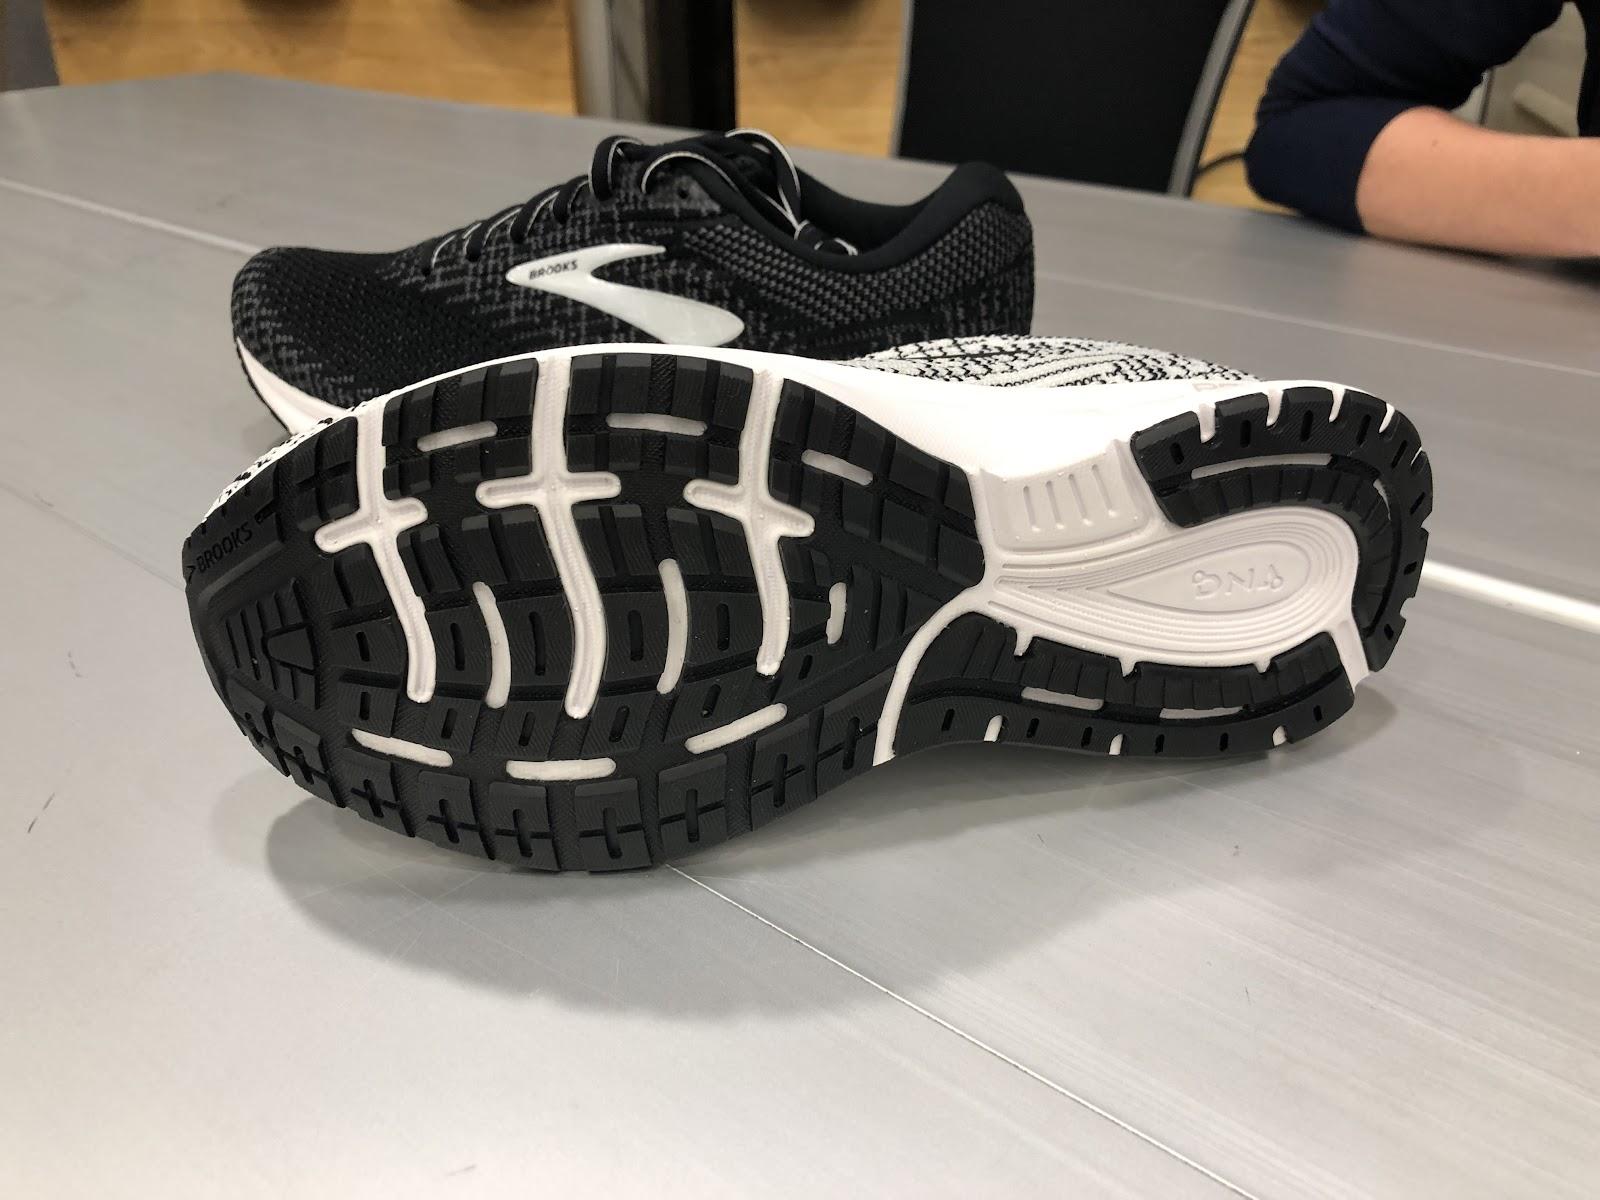 18634799866 Road Trail Run  Brooks Running 2019 Previews  Adrenaline GTS 20 ...